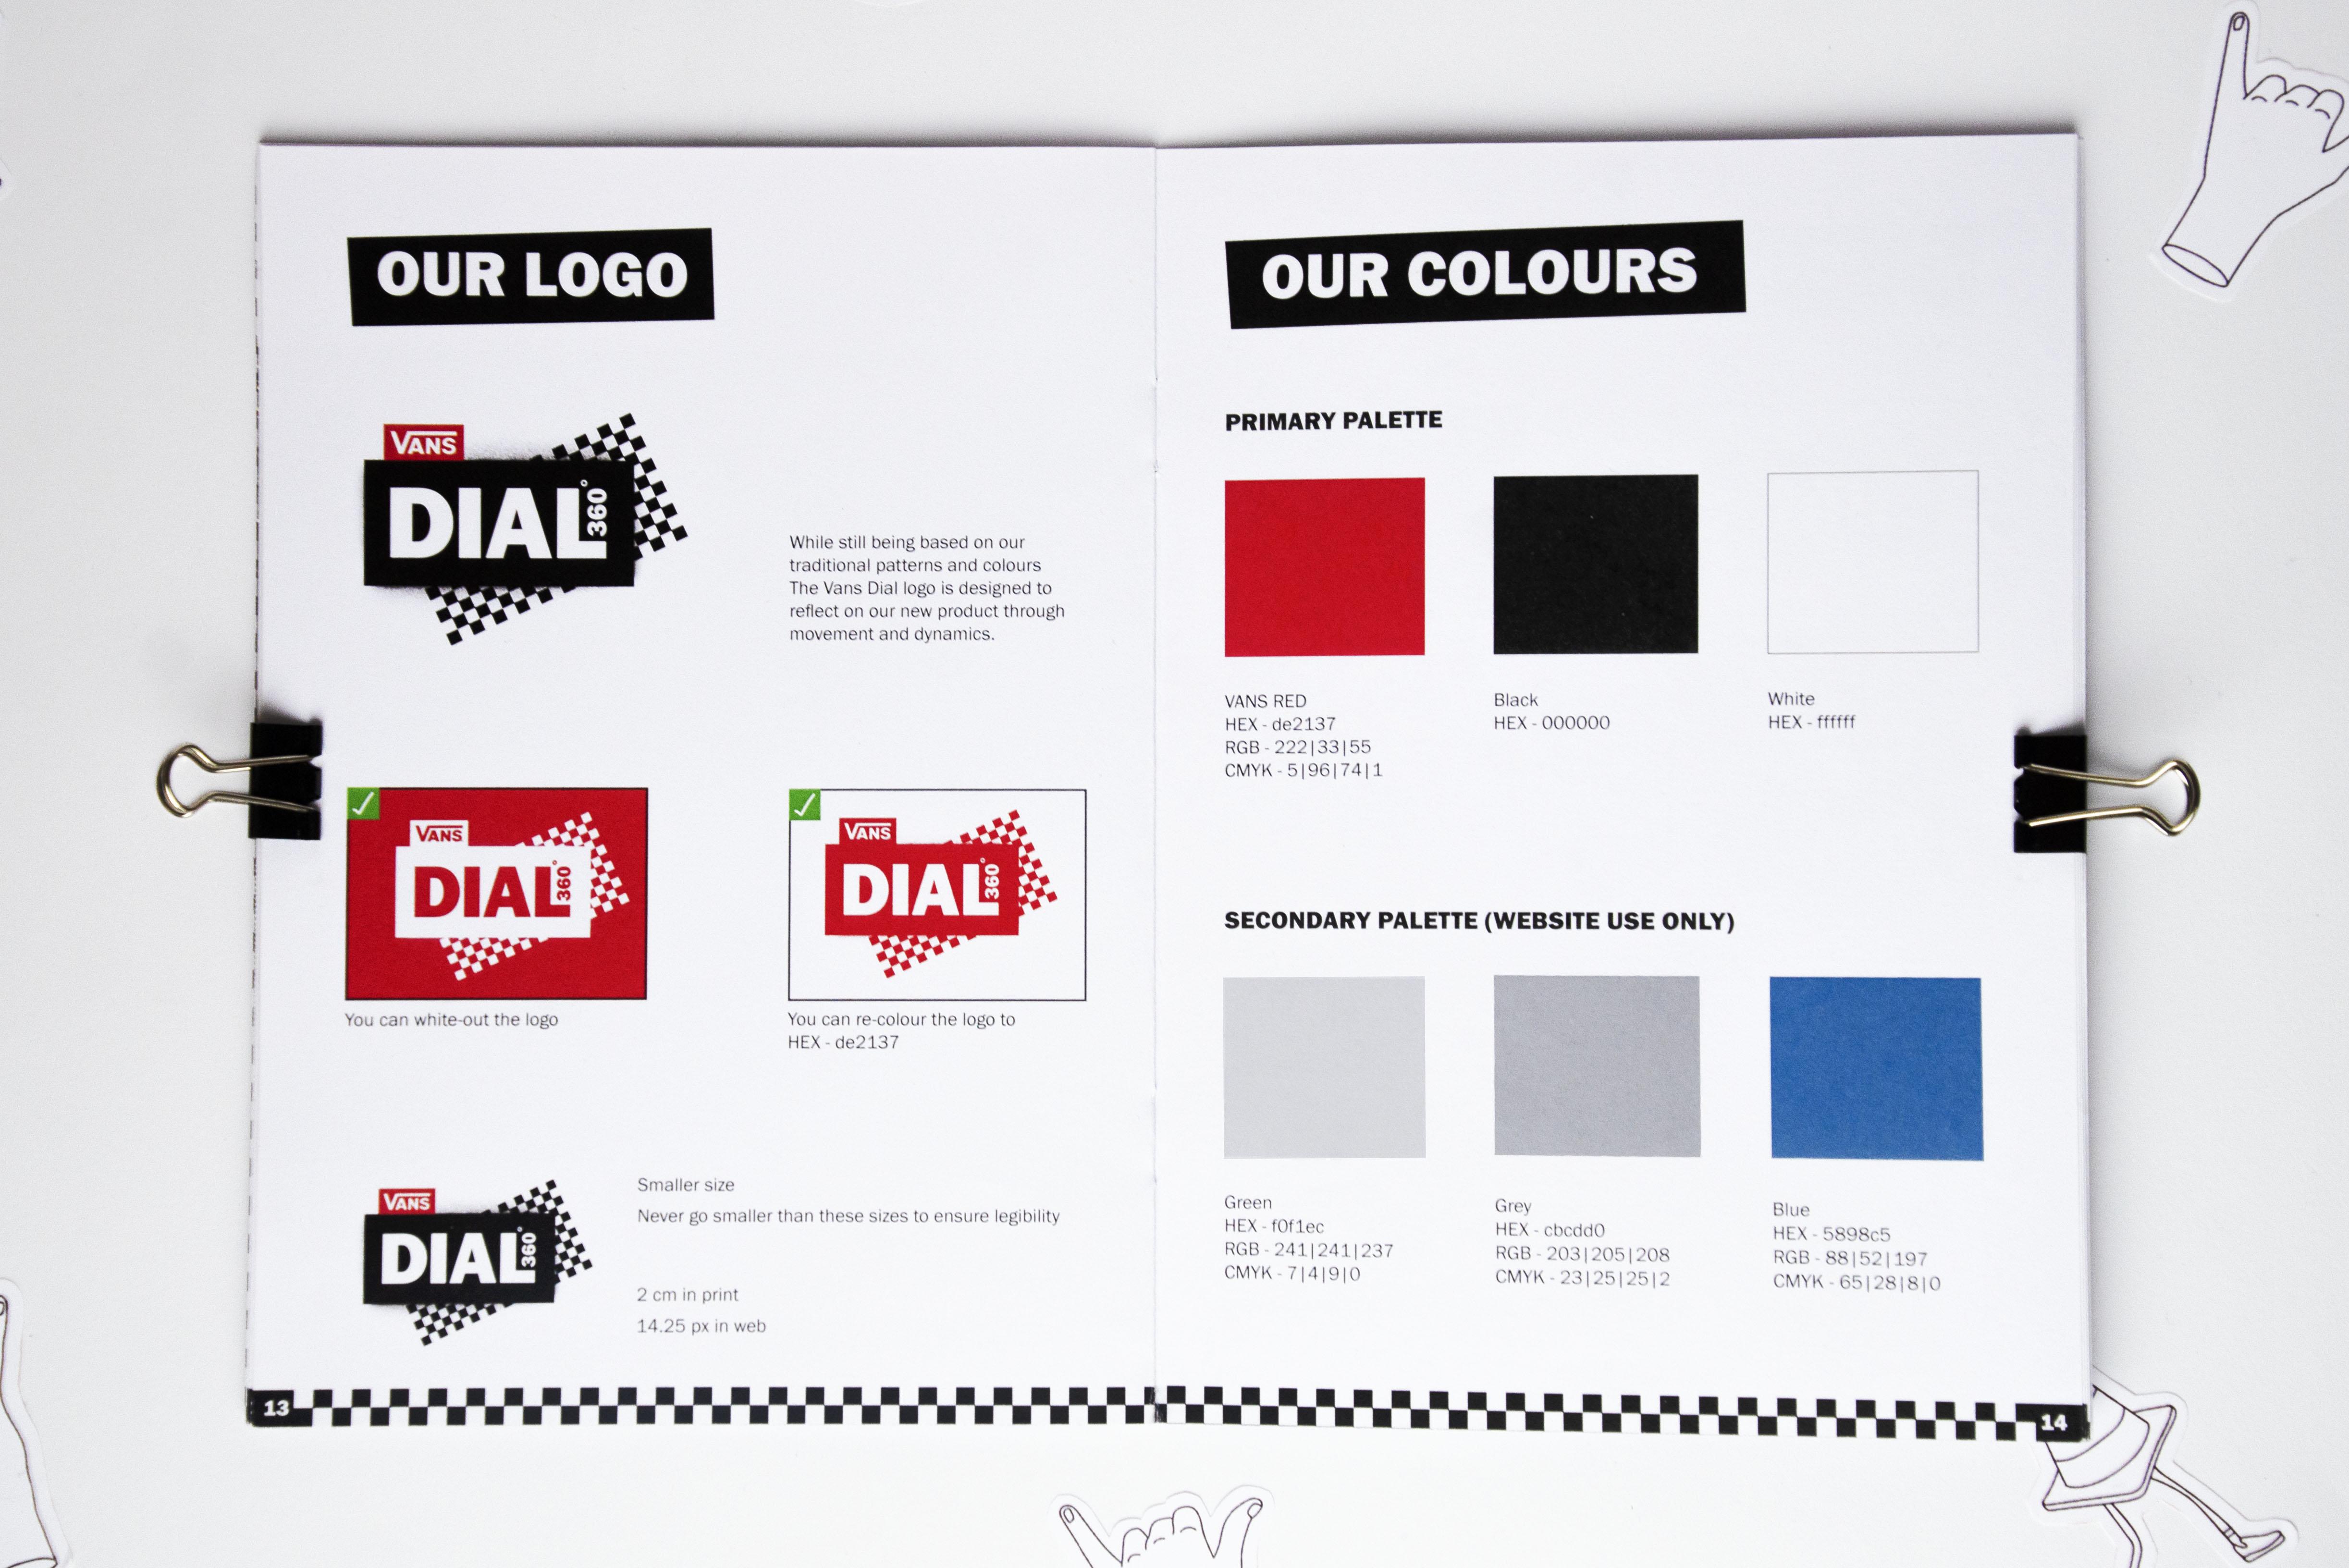 Photograph of VANS DIAL 360° brand book